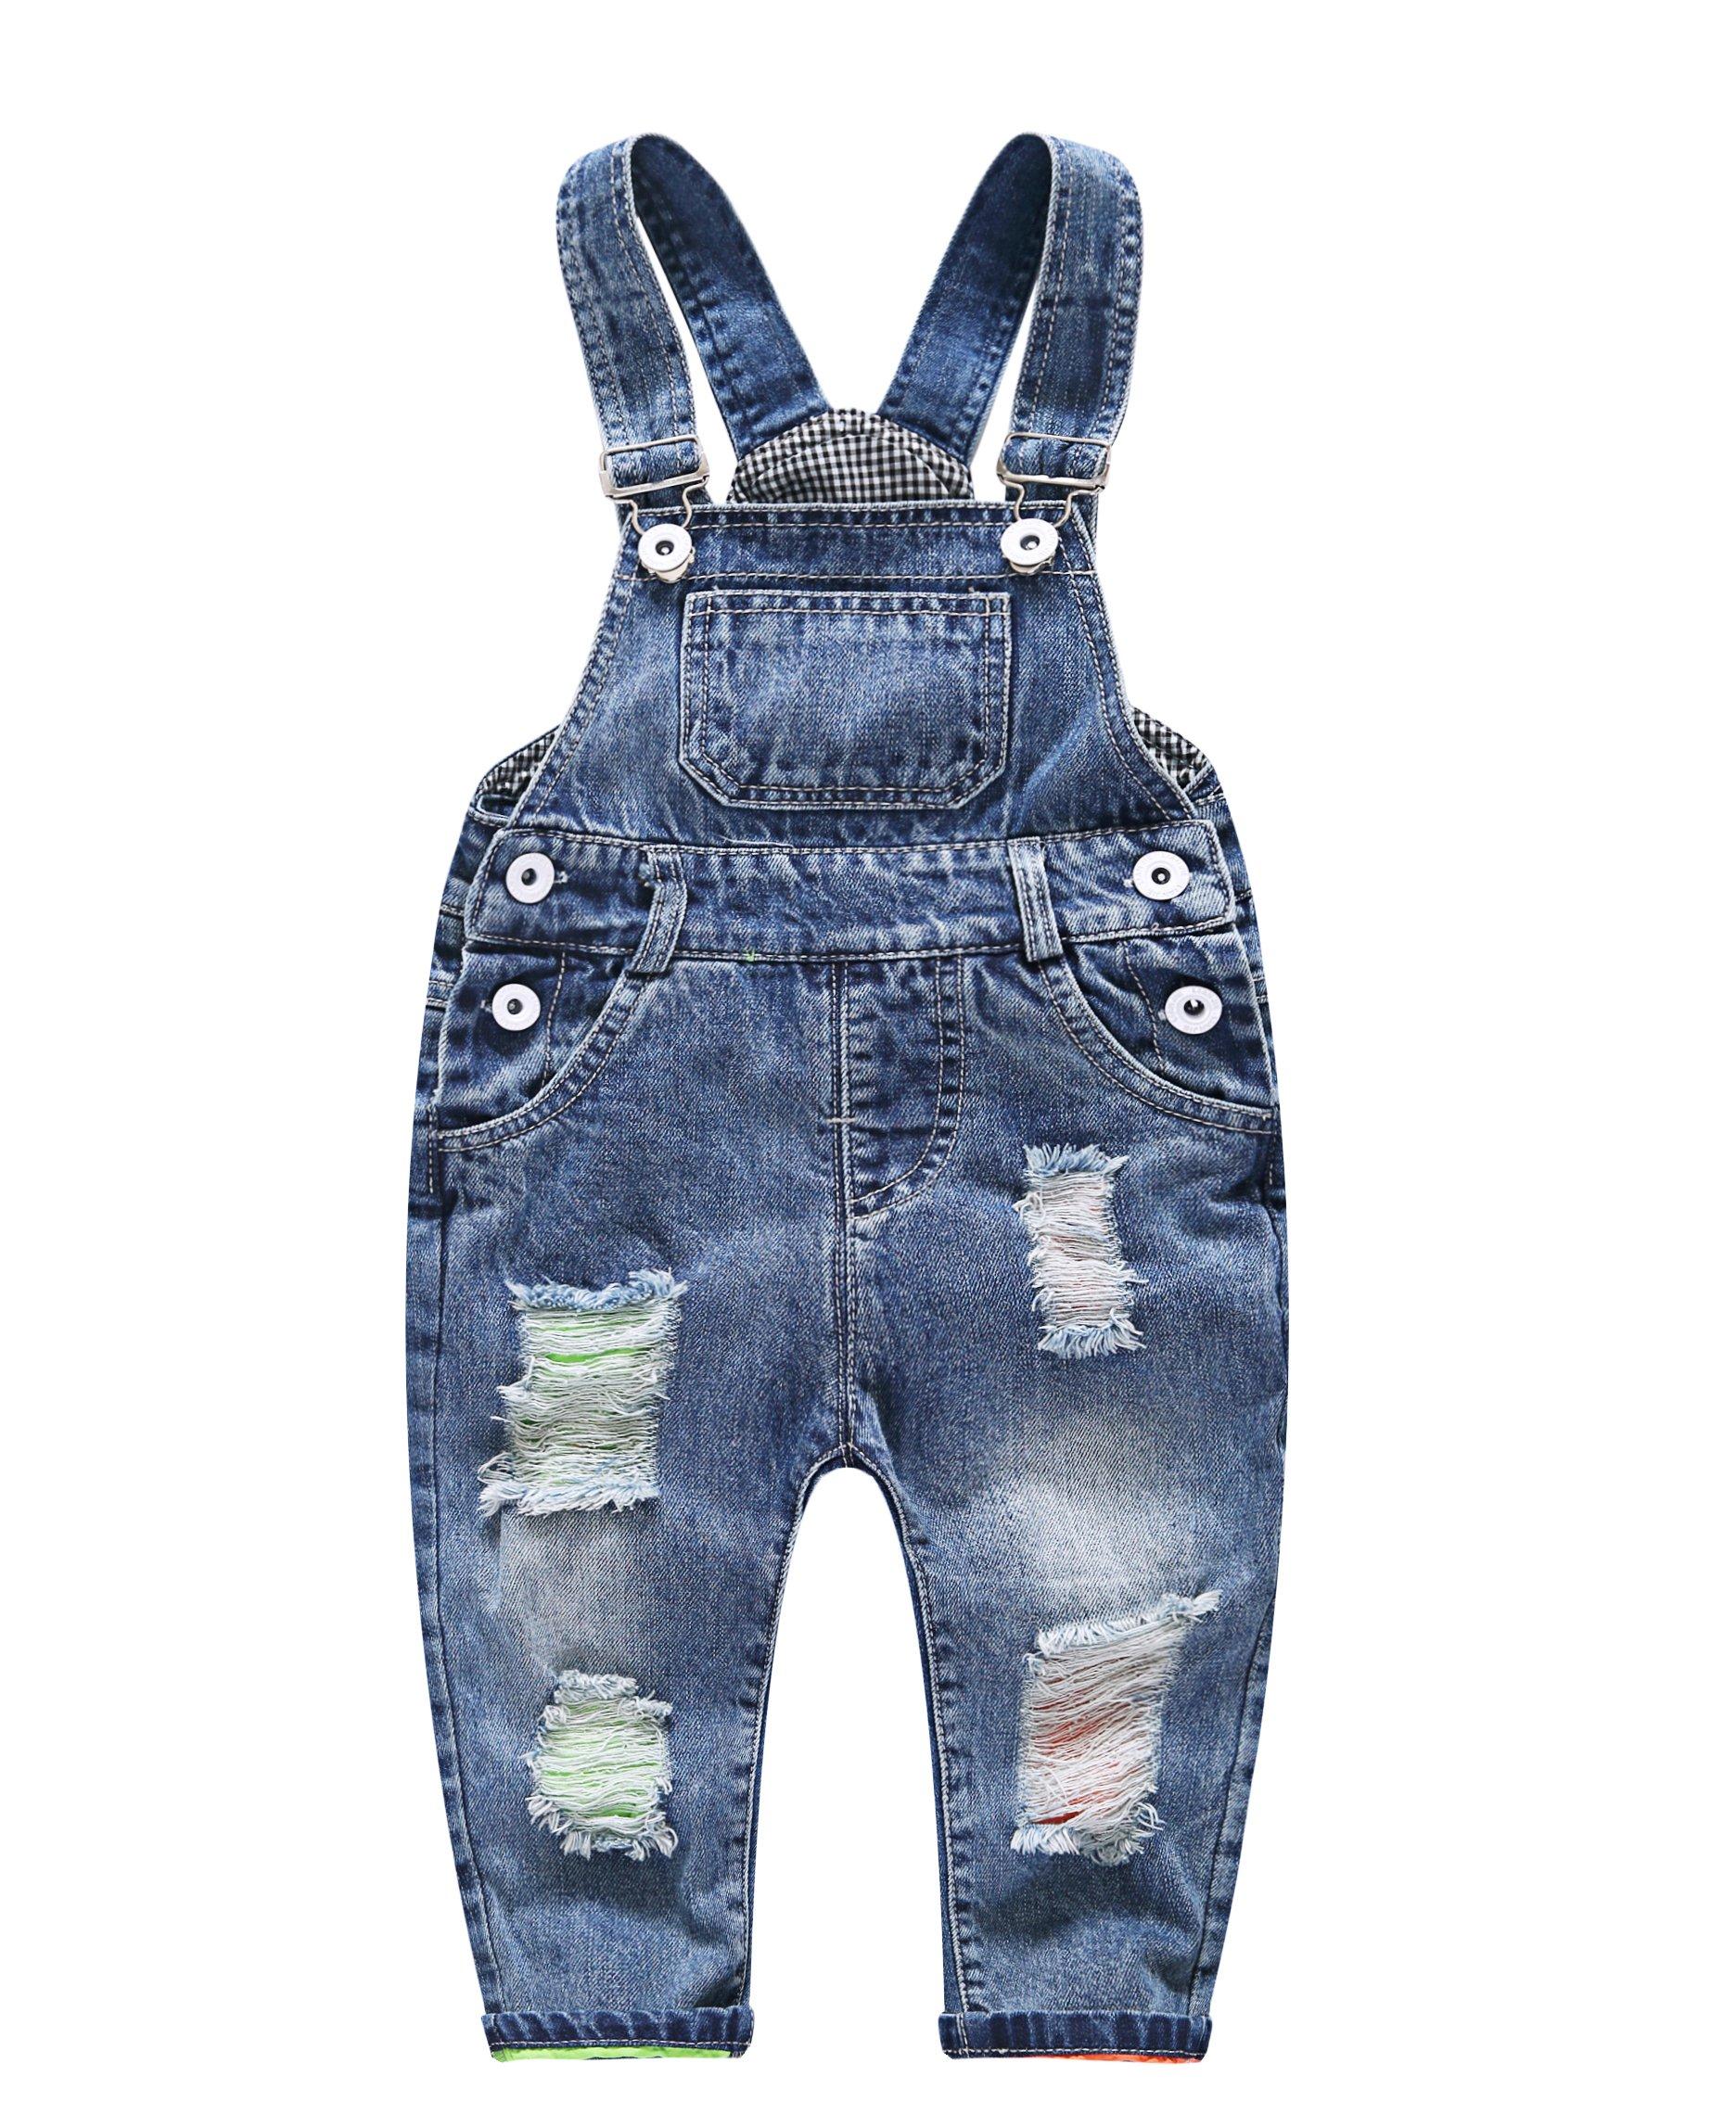 Kidscool Bebé & Pequeños Niños/Niñas Ripped Holes Bibibvans Total 1